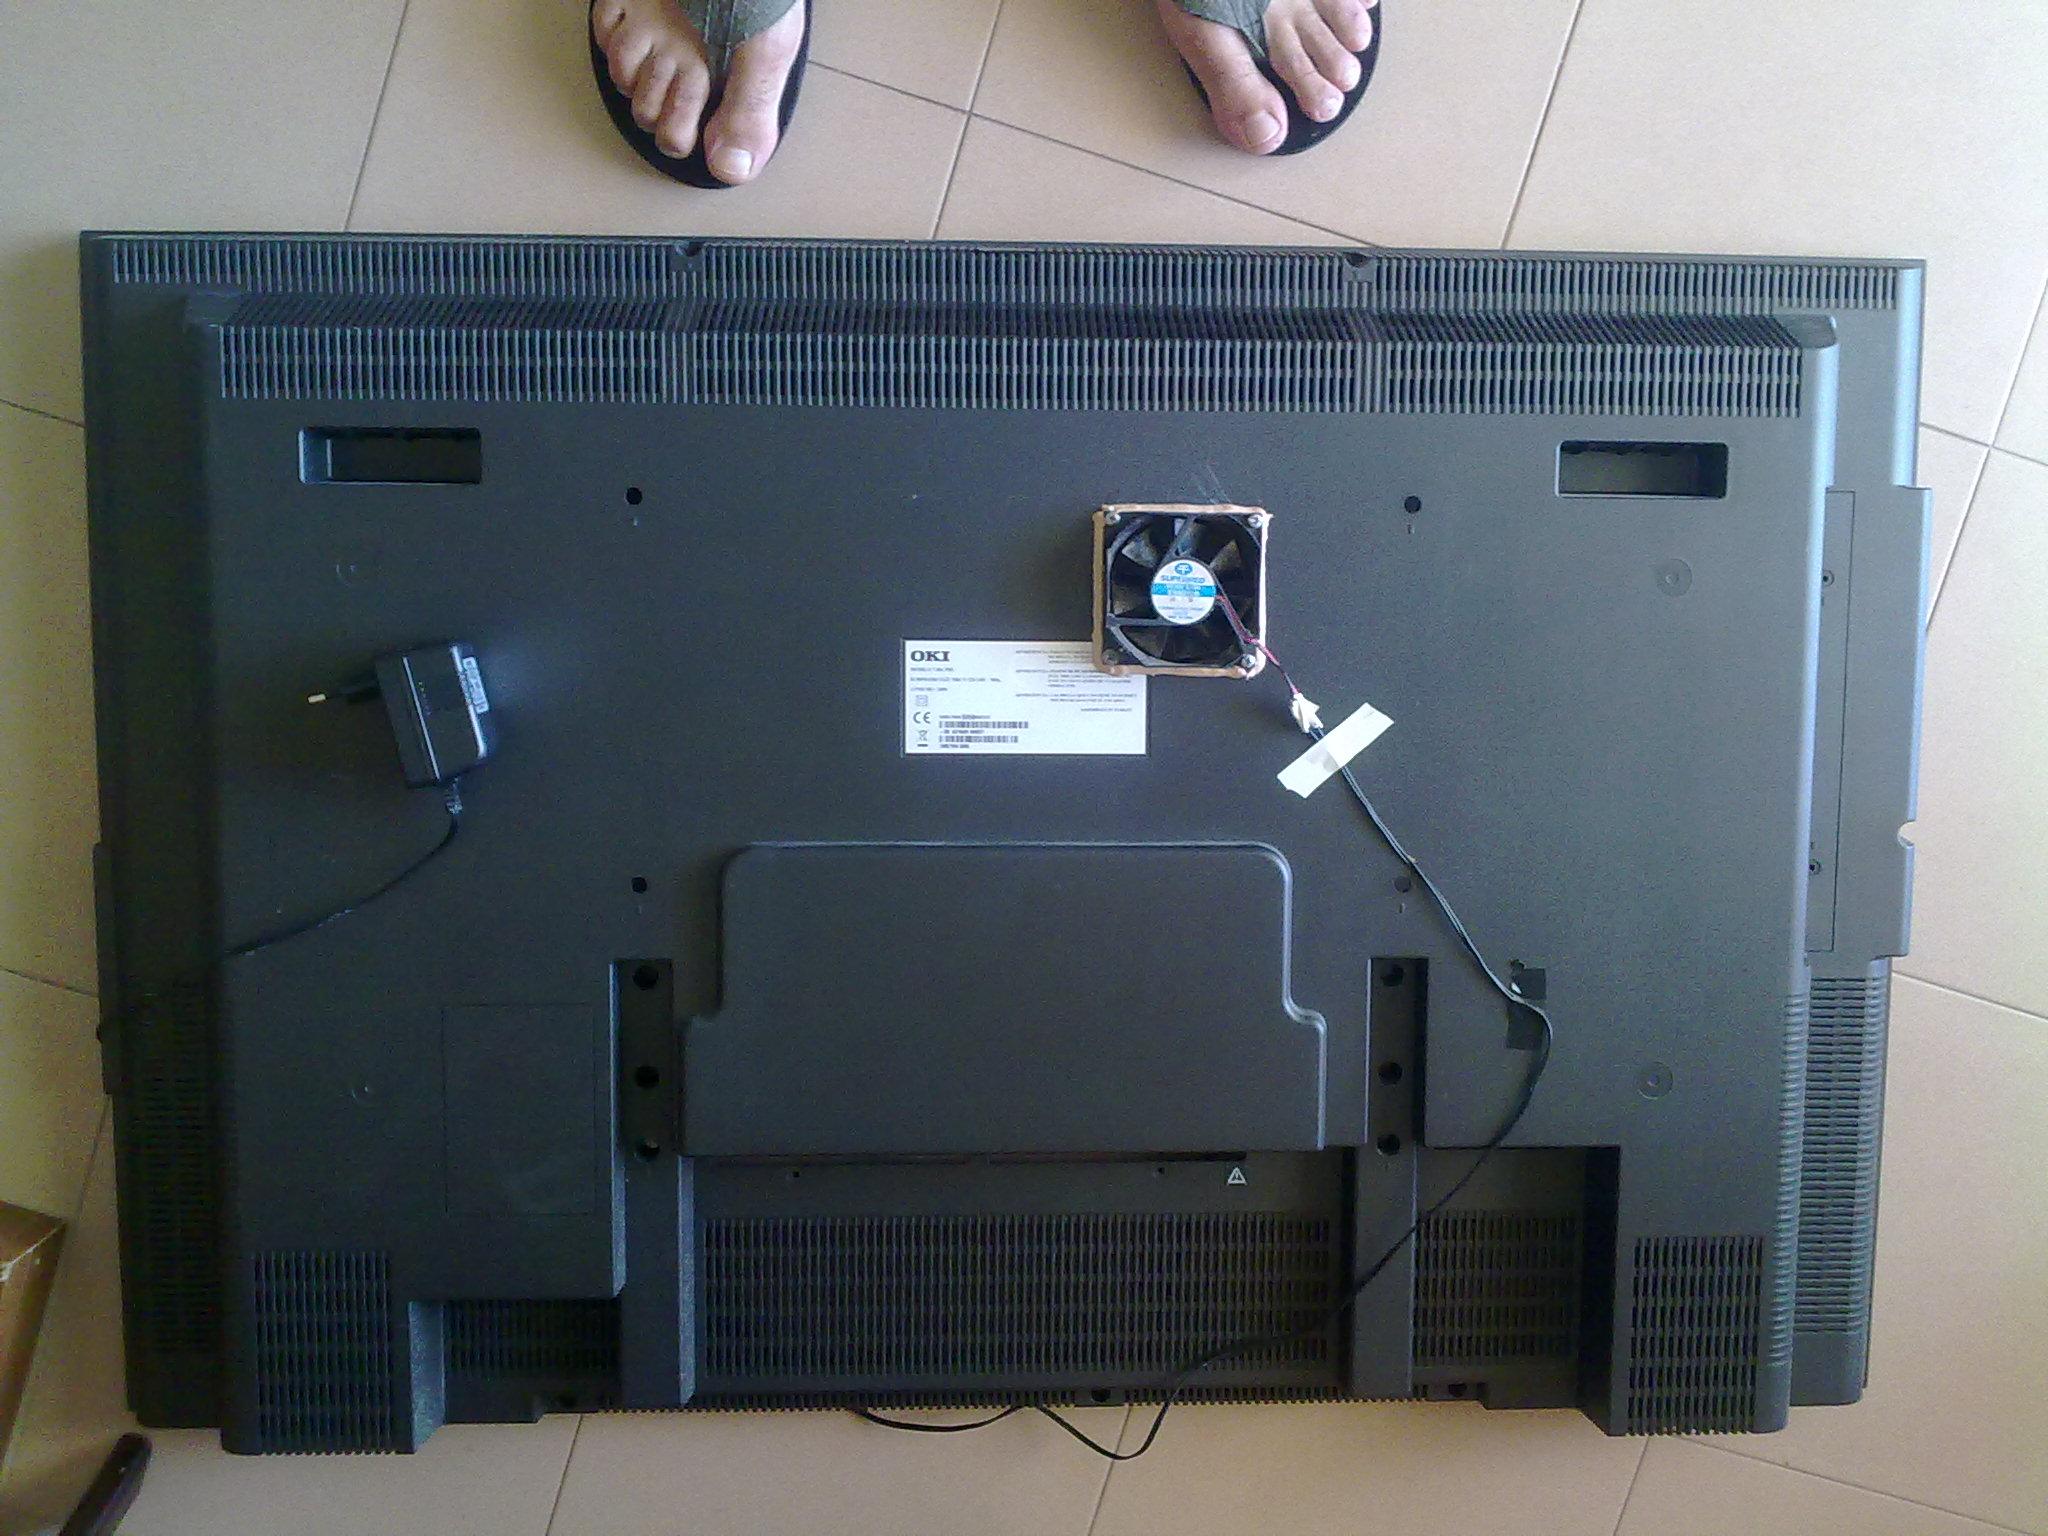 Reparar una tv lcd que se apaga sola soloelectronicos for Reparar pantalla televisor samsung